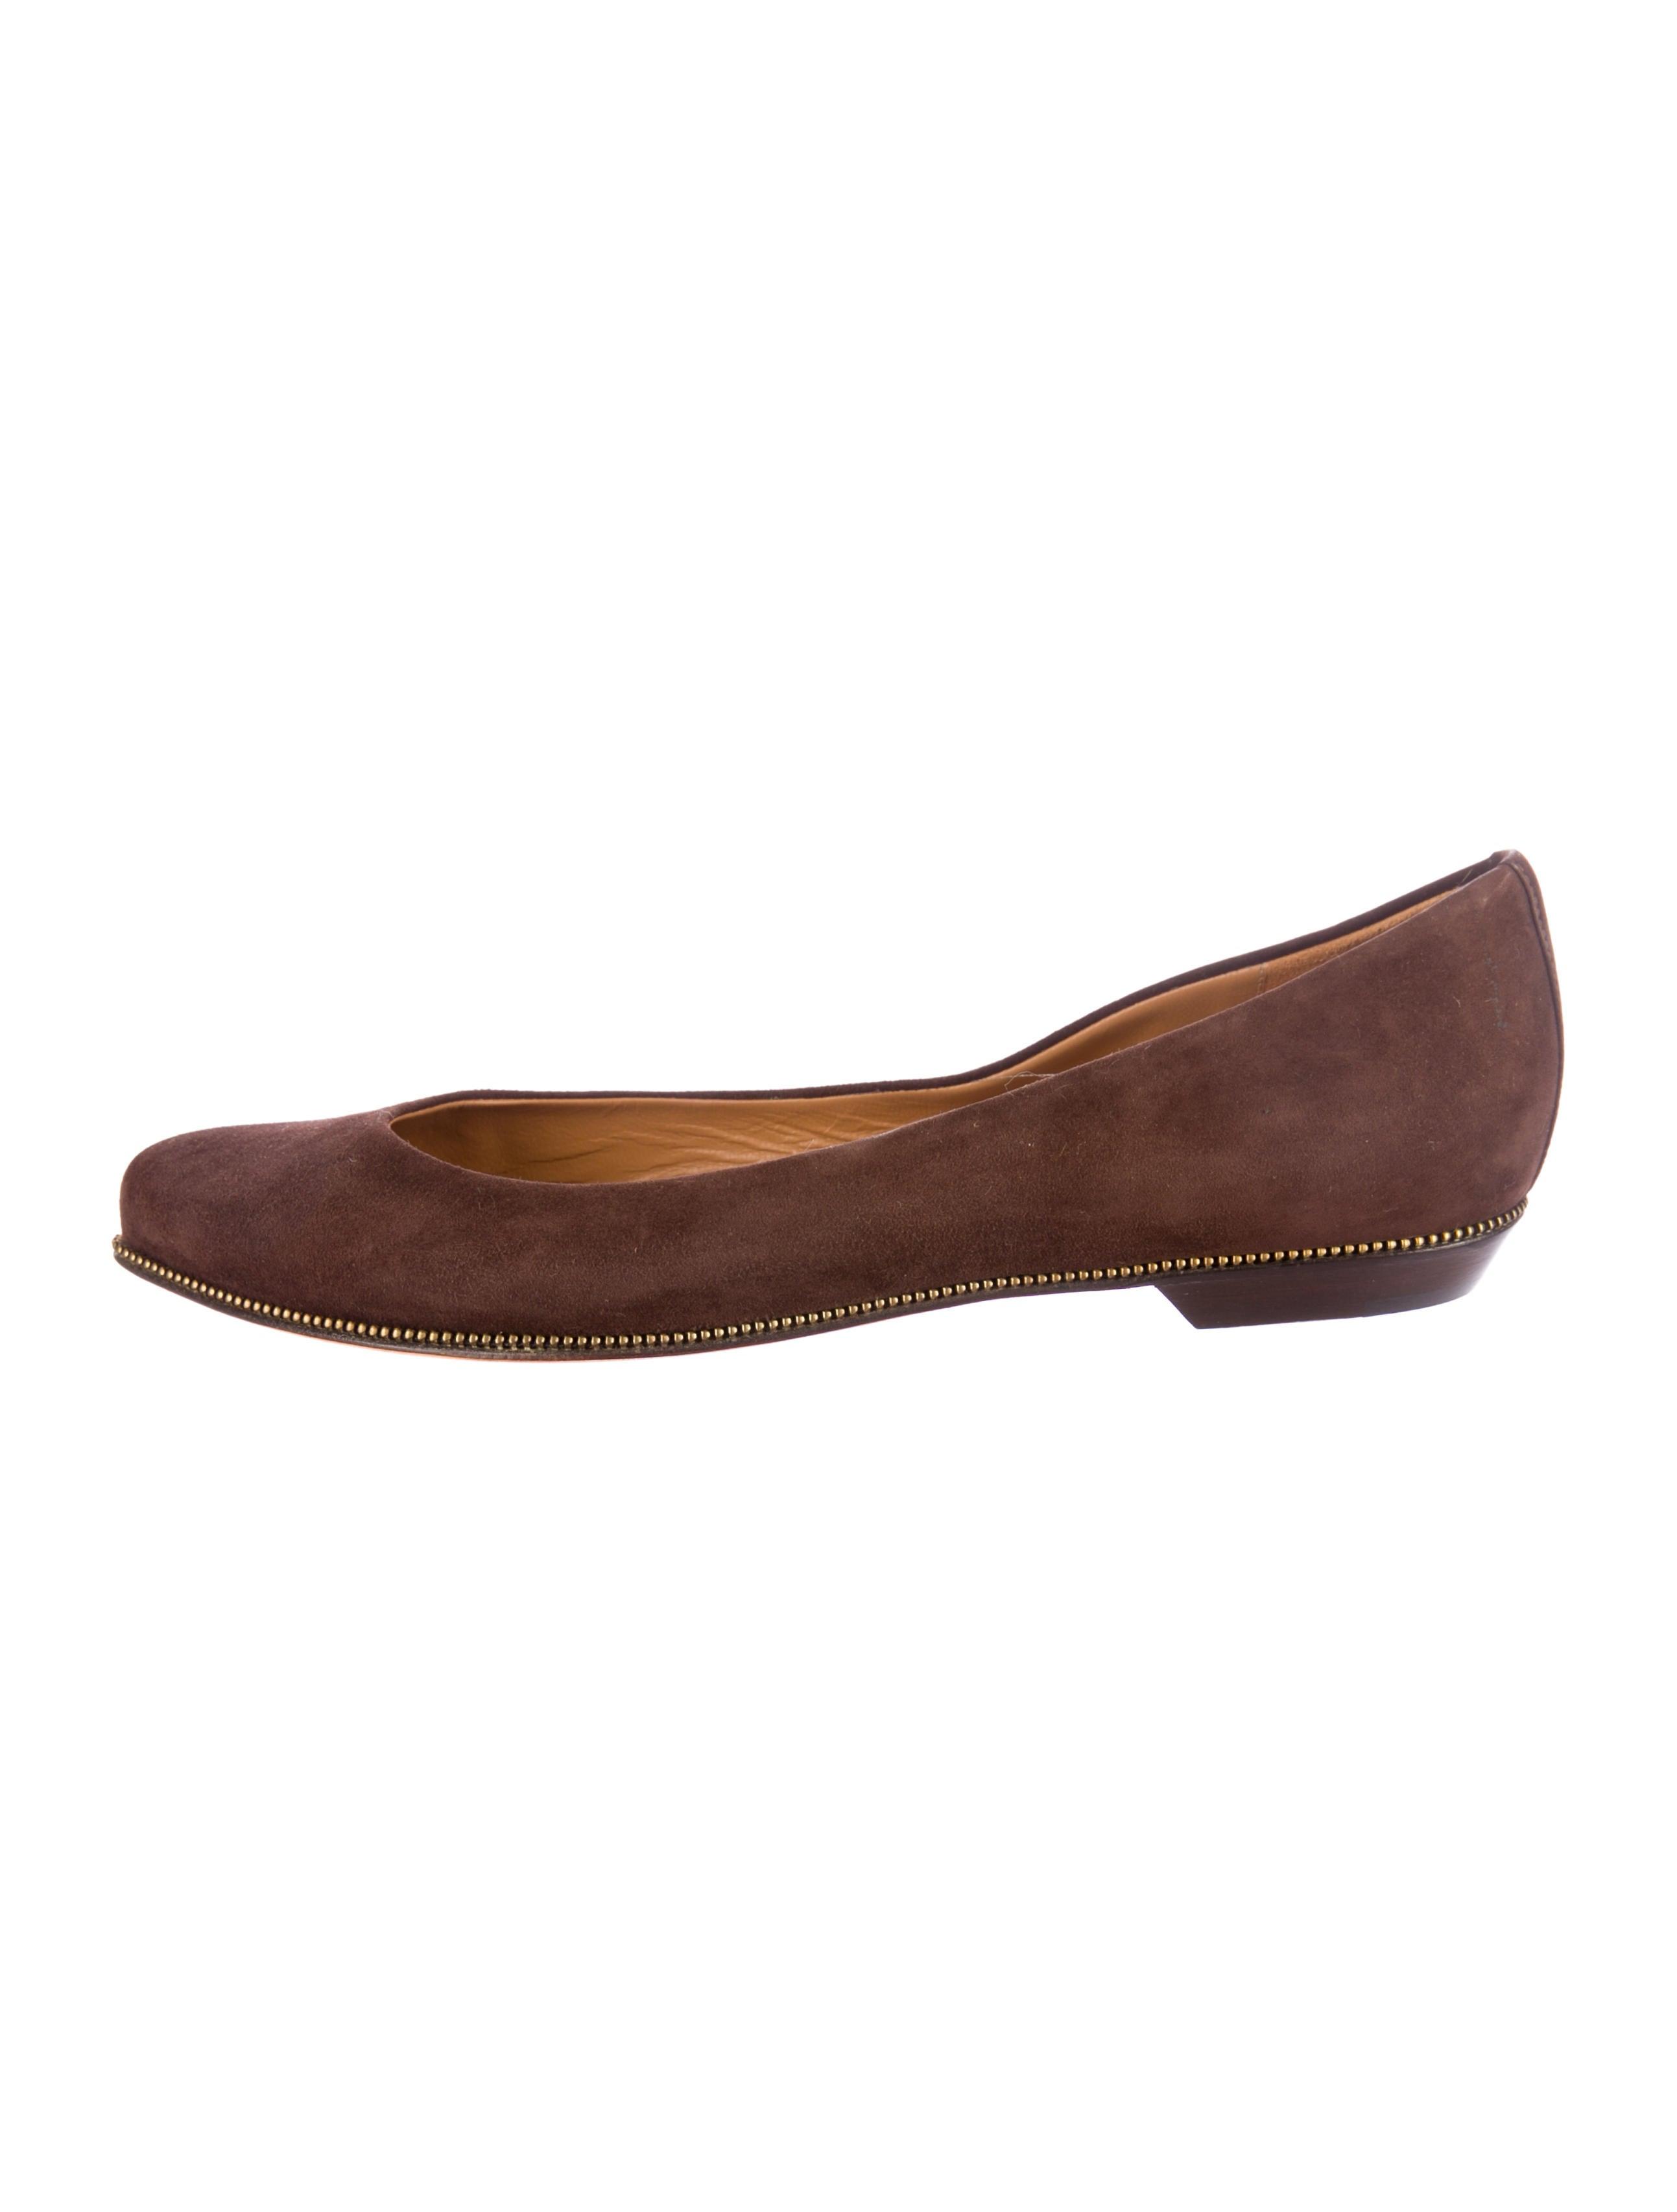 givenchy flats shoes giv24774 the realreal